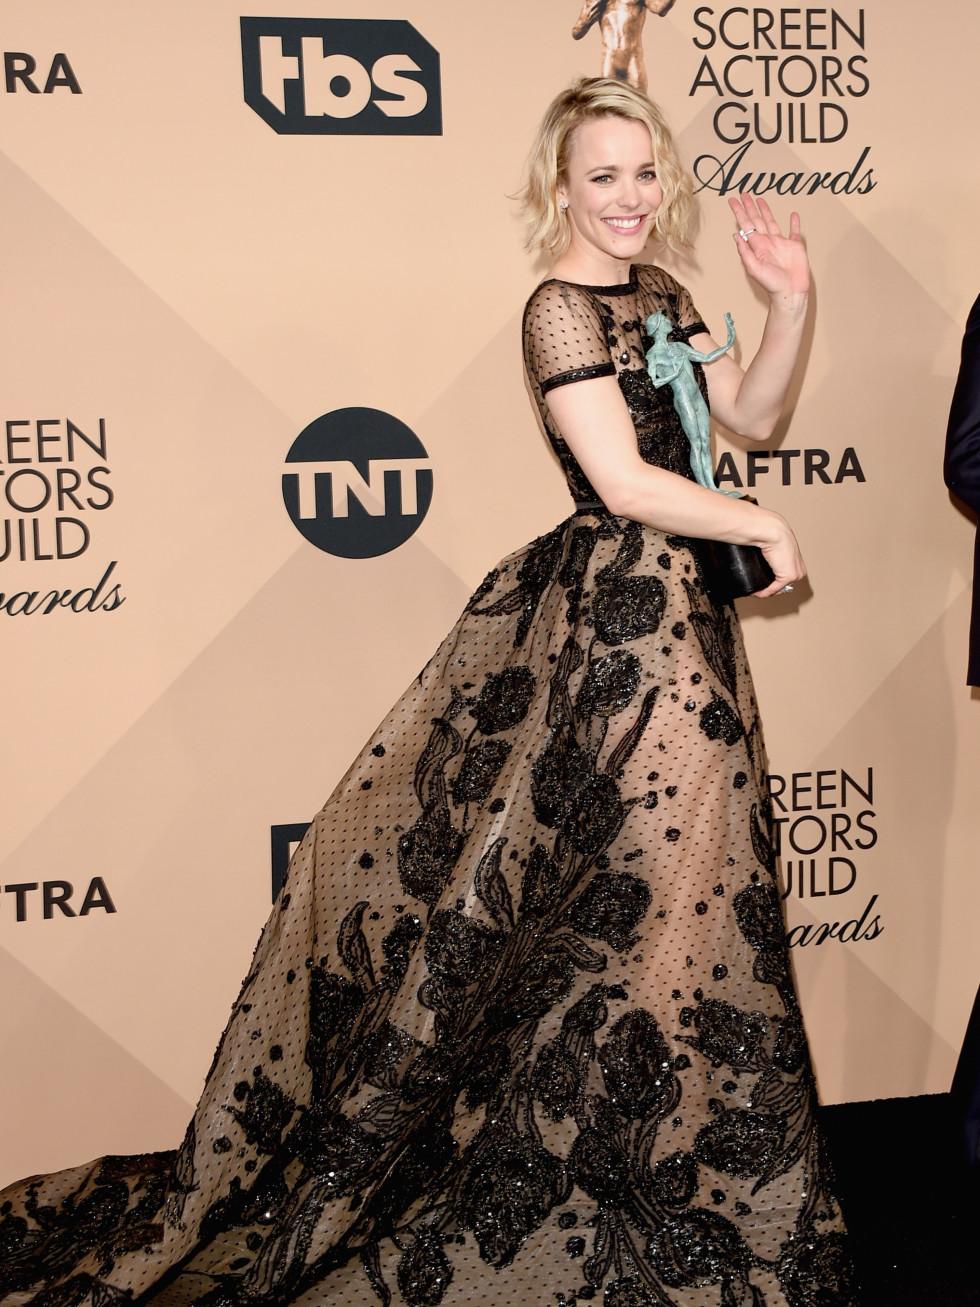 Rachel Adams at Screen Actors Guild Awards